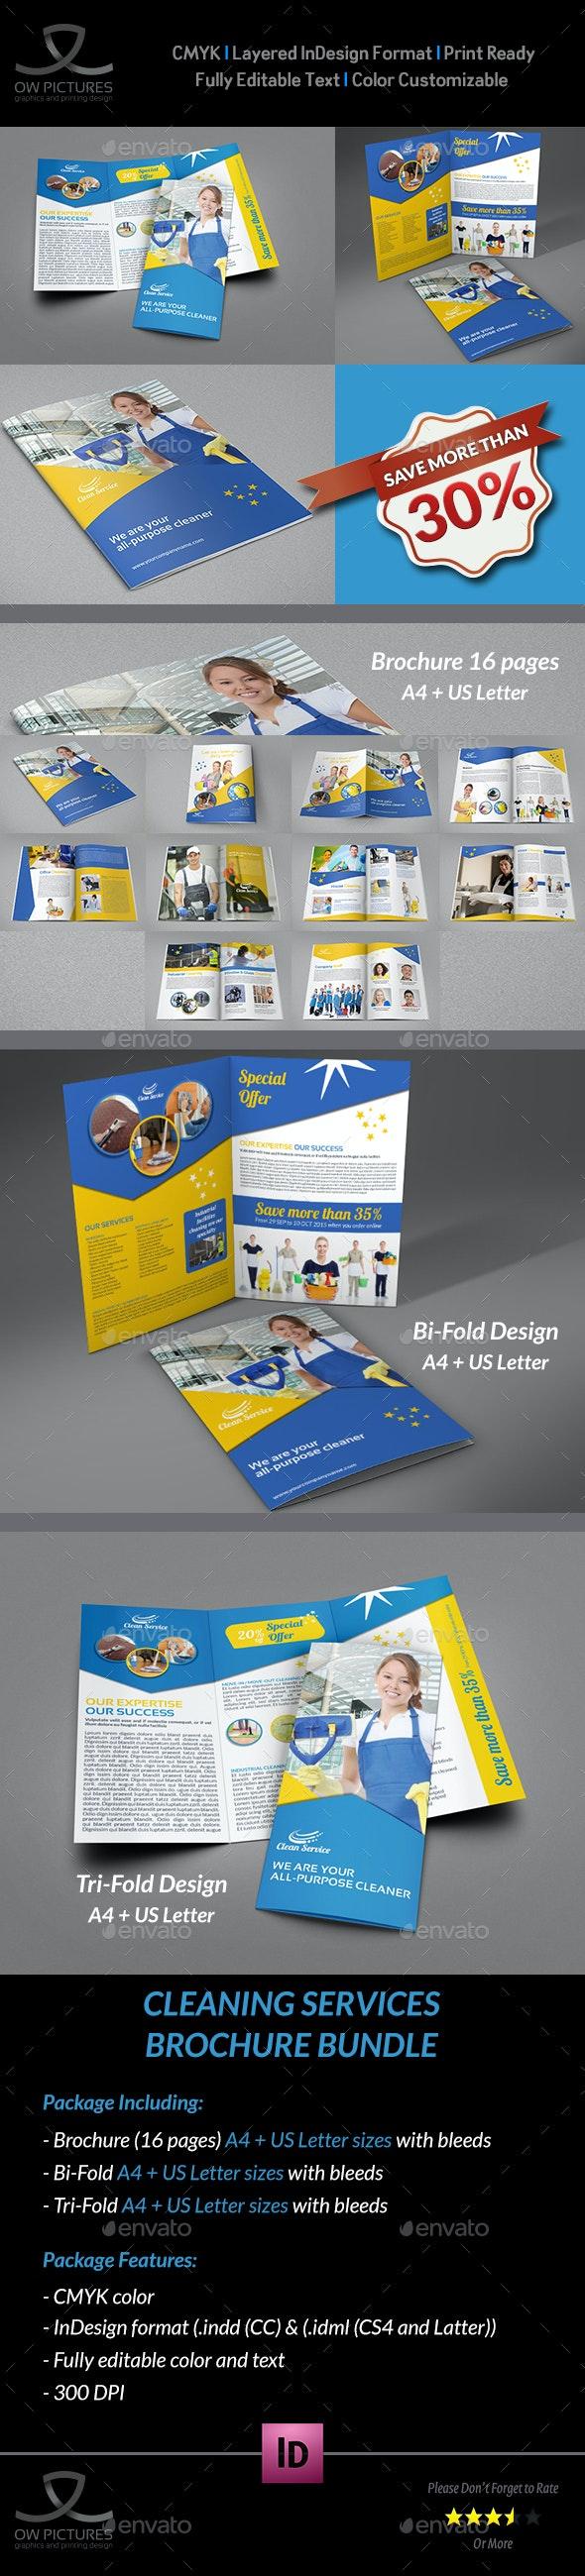 Cleaning Services Brochure Bundle Template - Brochures Print Templates